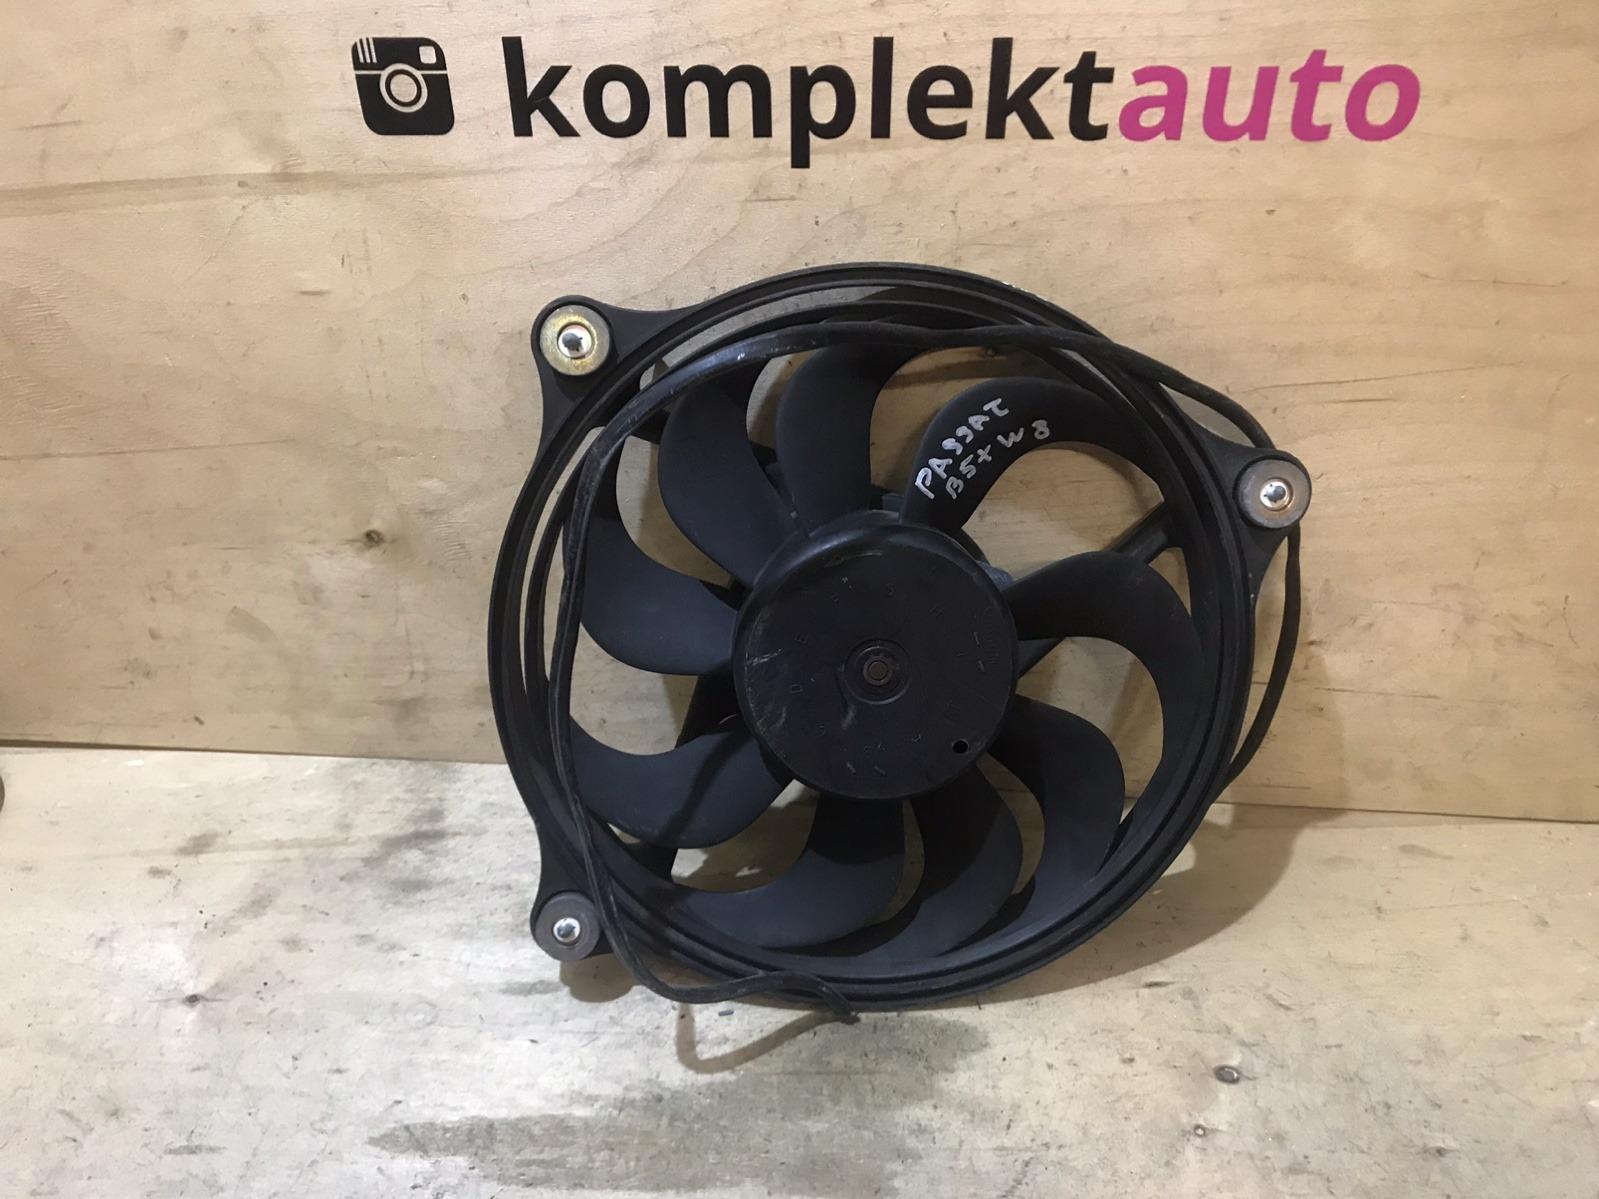 Вентилятор радиатора Volkswagen Passat B5+ 4.0 W8 (б/у)